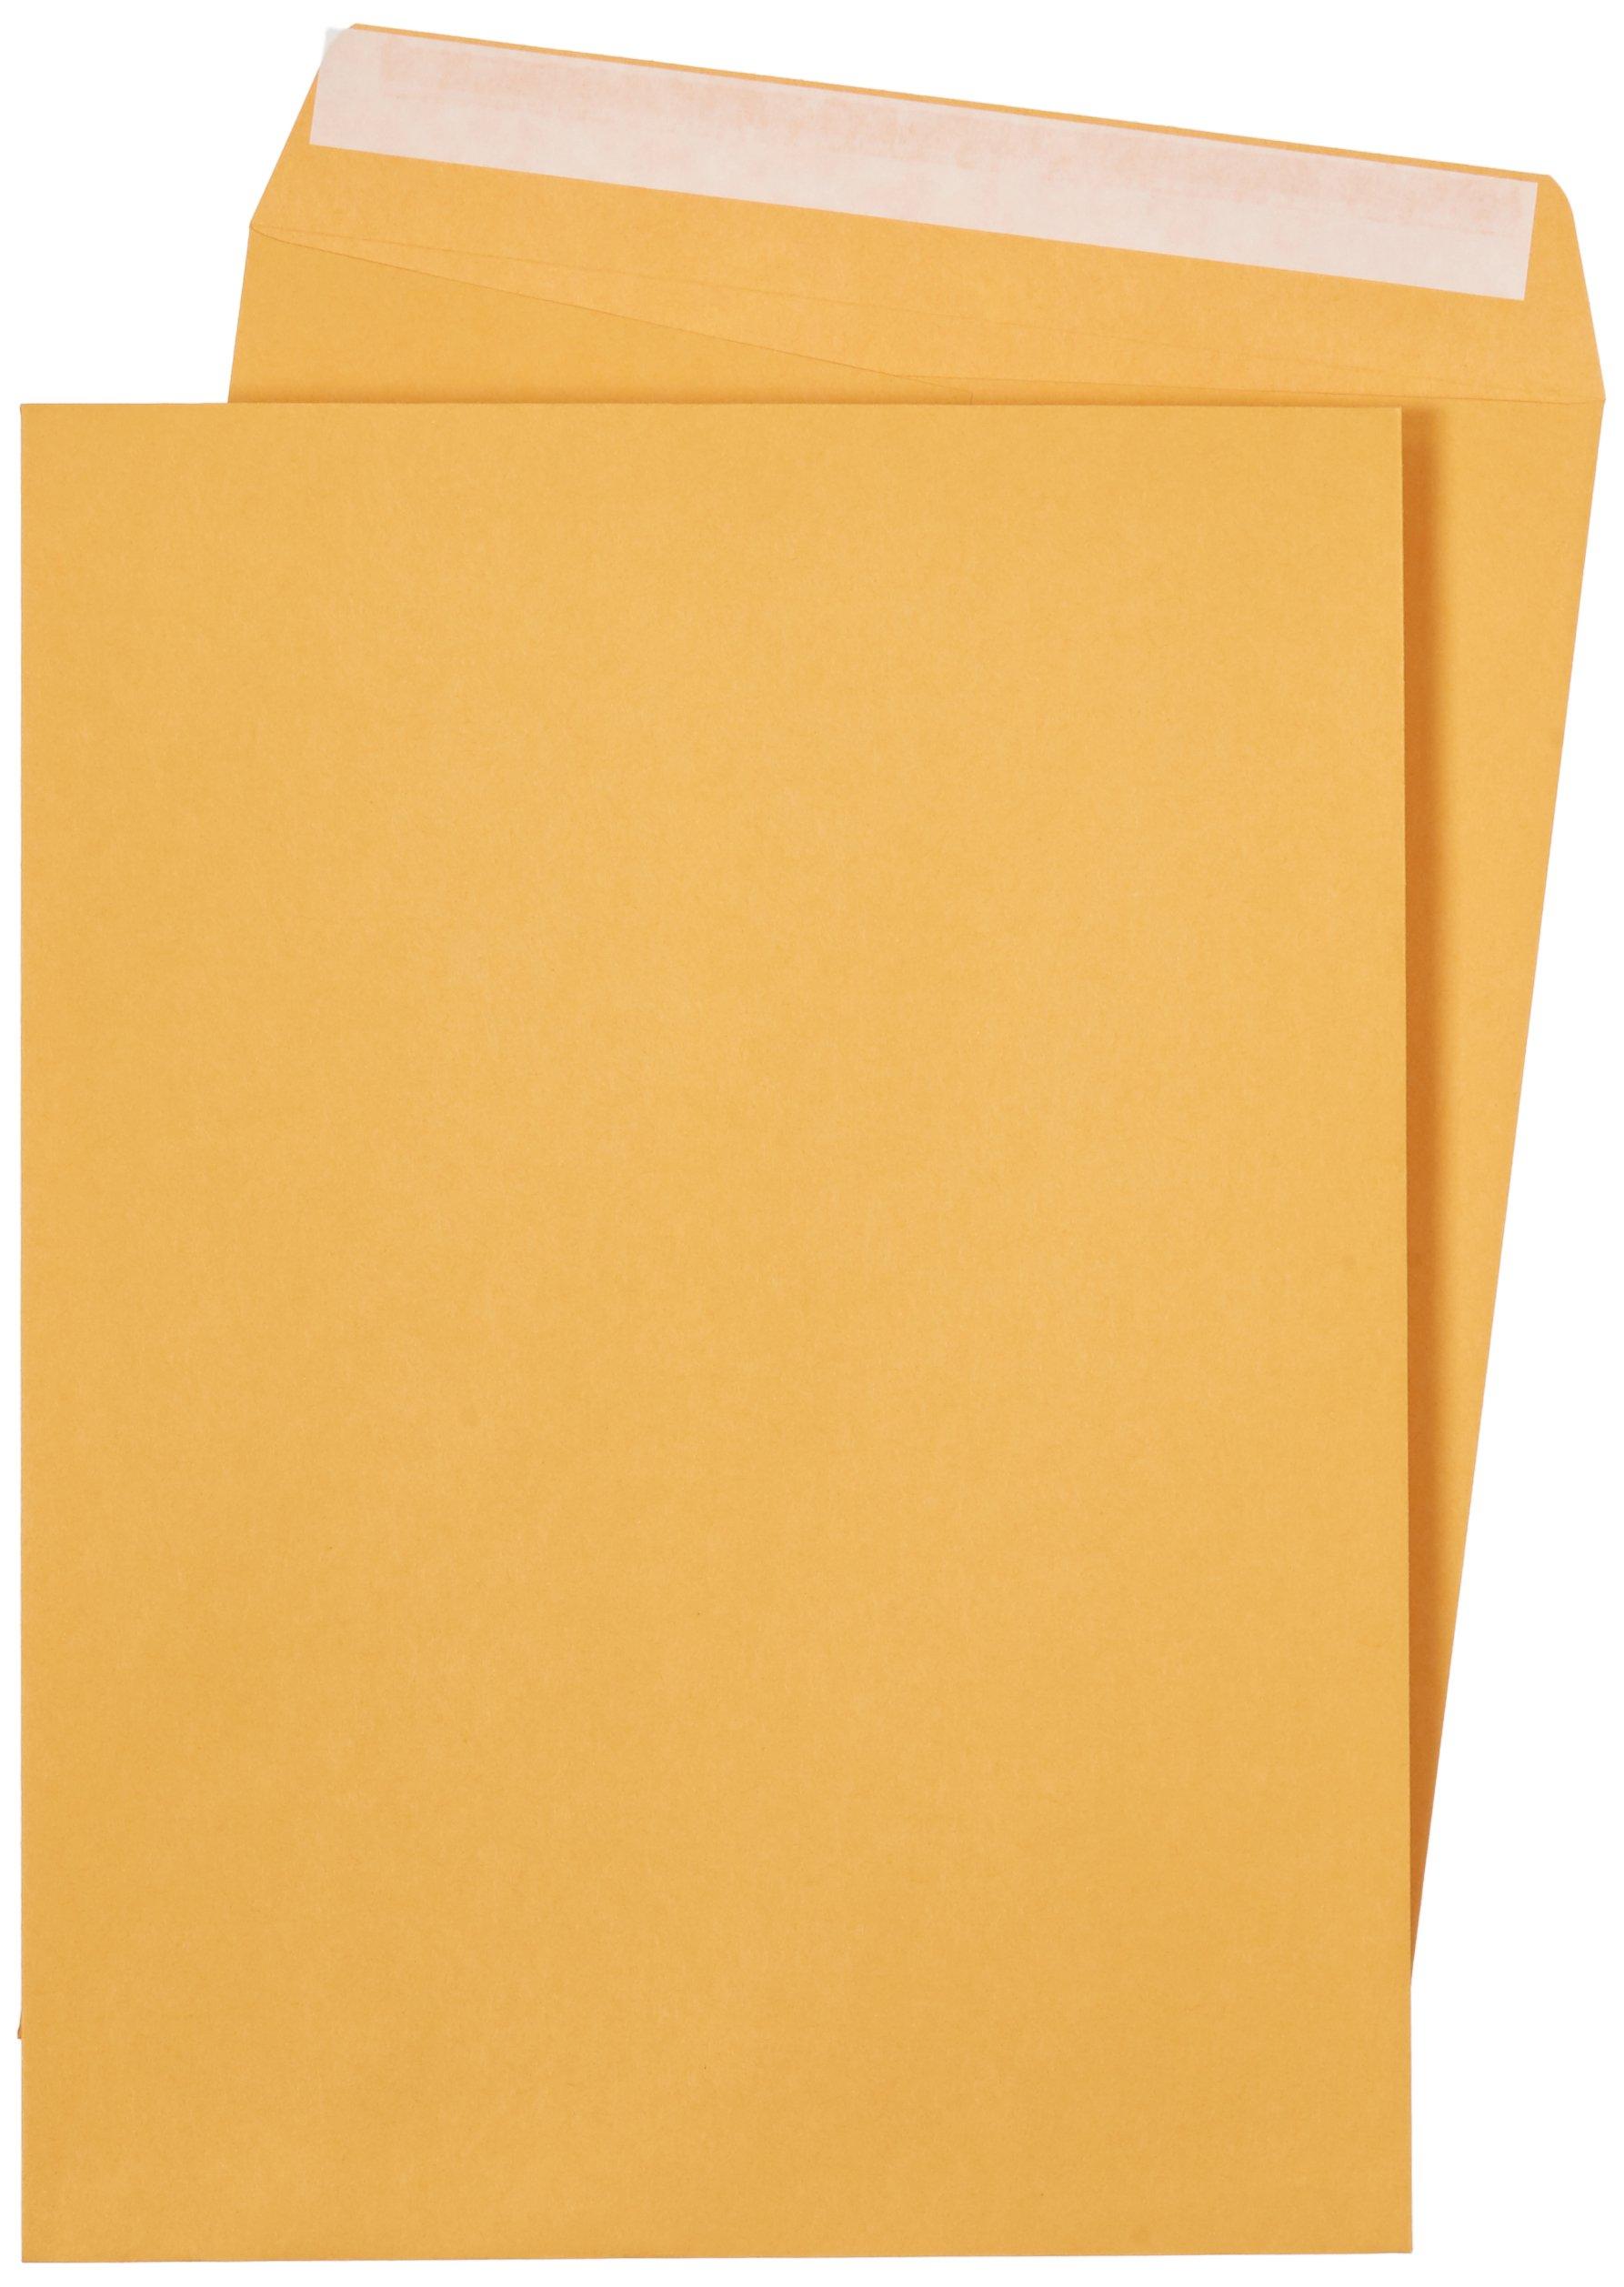 AmazonBasics Catalog Mailing Envelopes, Peel & Seal, 9x12 Inch, Brown Kraft, 250-Pack - AMZA31 by AmazonBasics